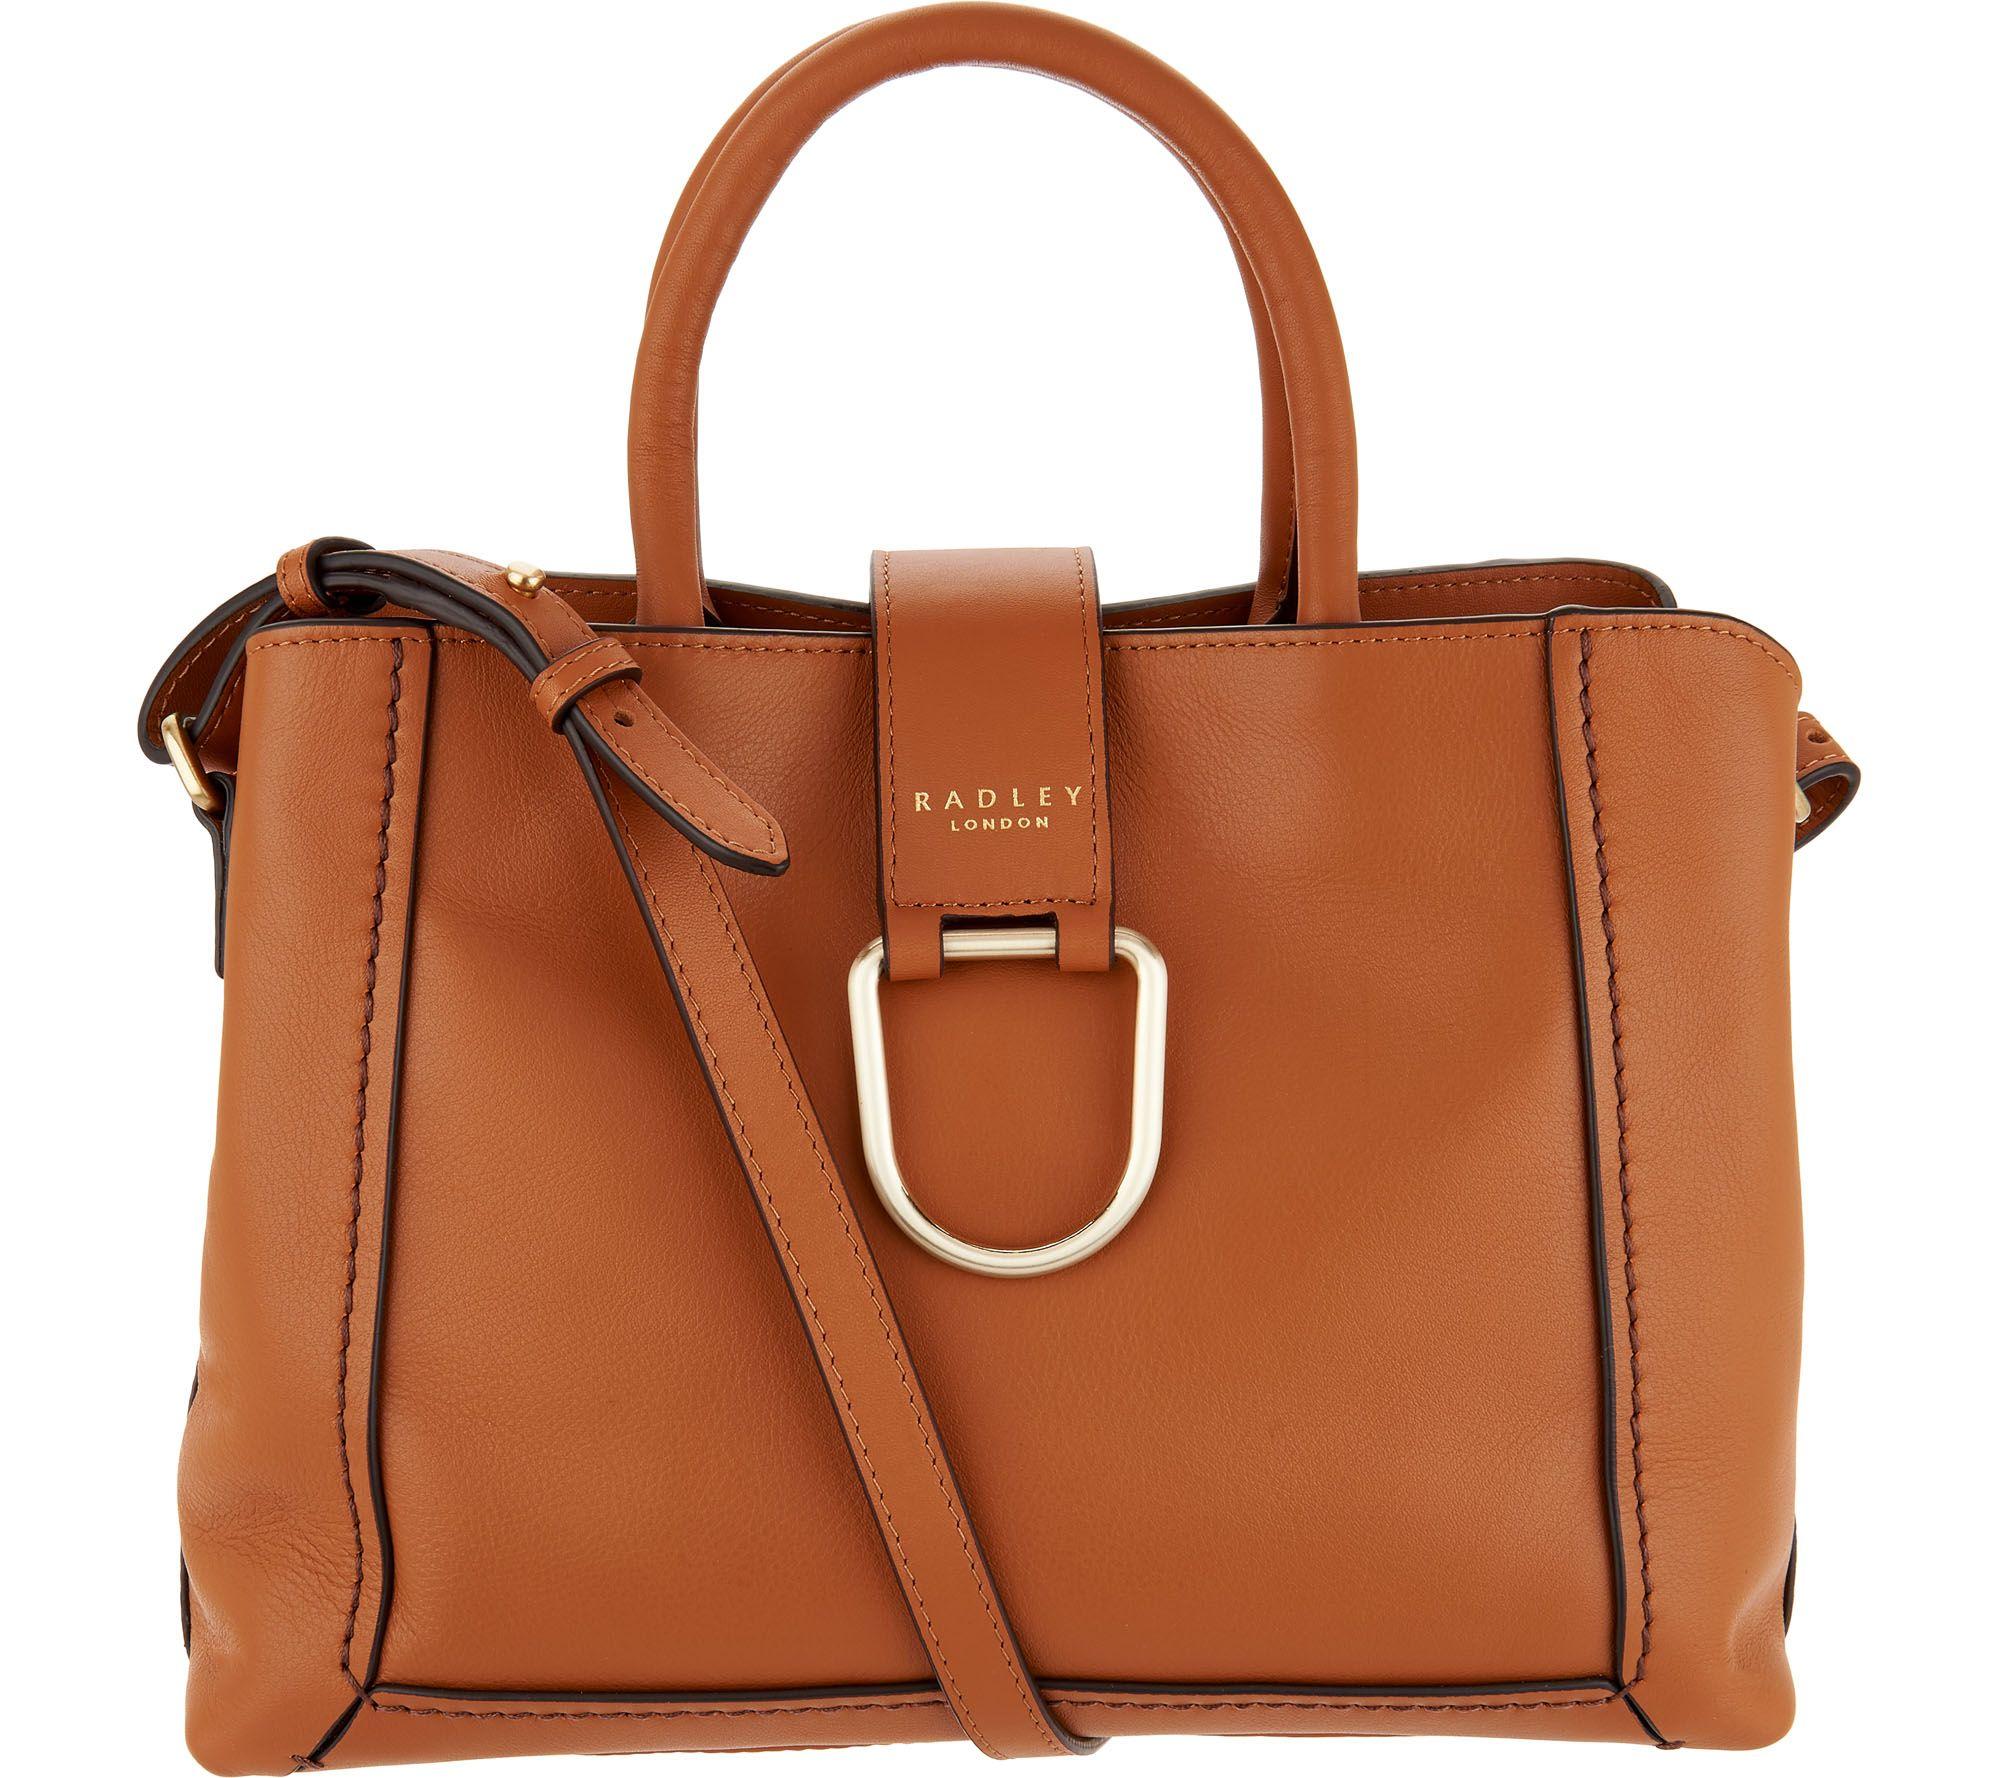 As Is Radley London Primrose Hill Leather Satchel Handbag A306300